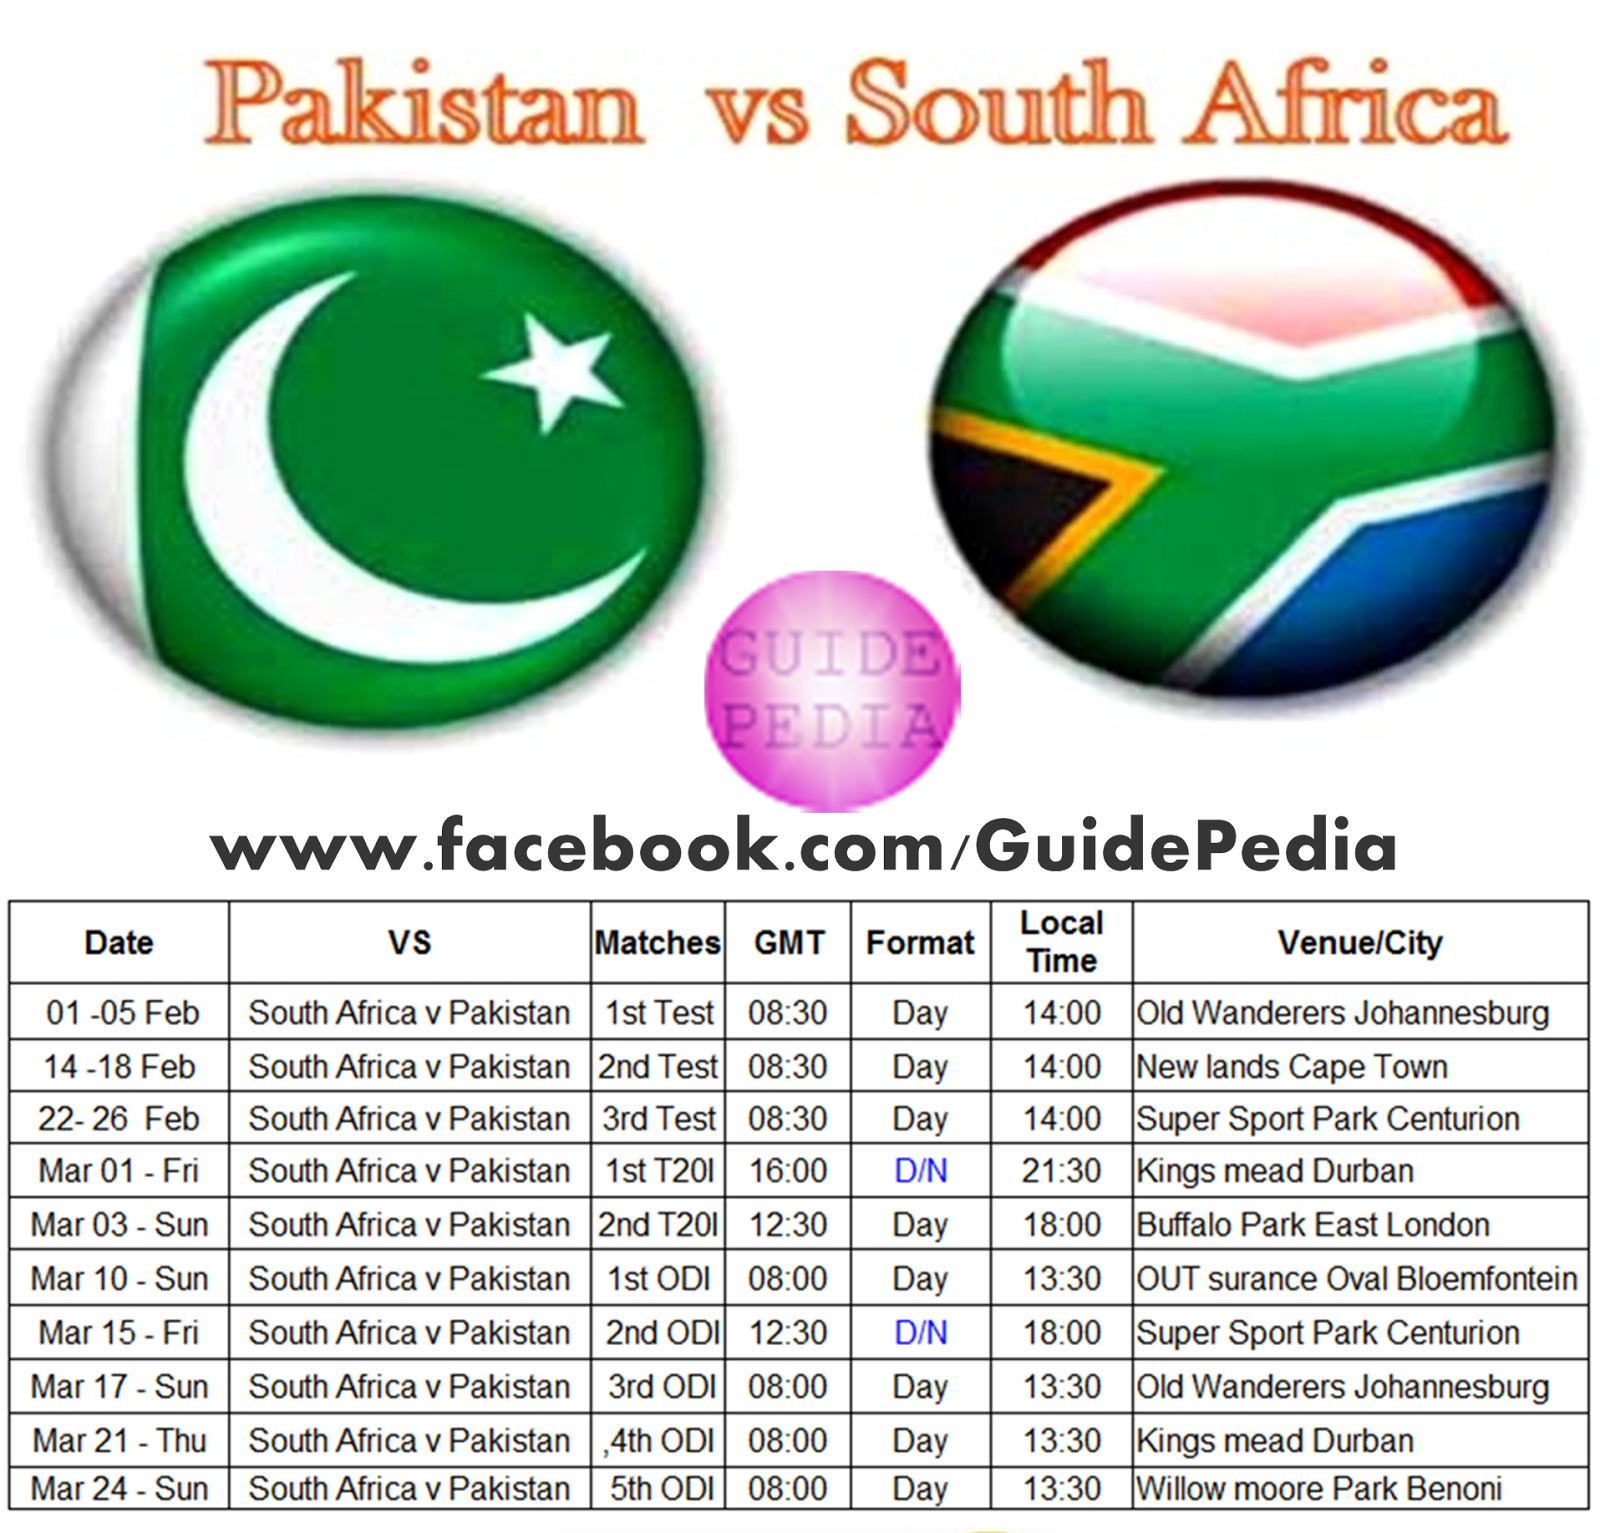 Pakistan Vs South Africa Series 2013 | GuidePedia